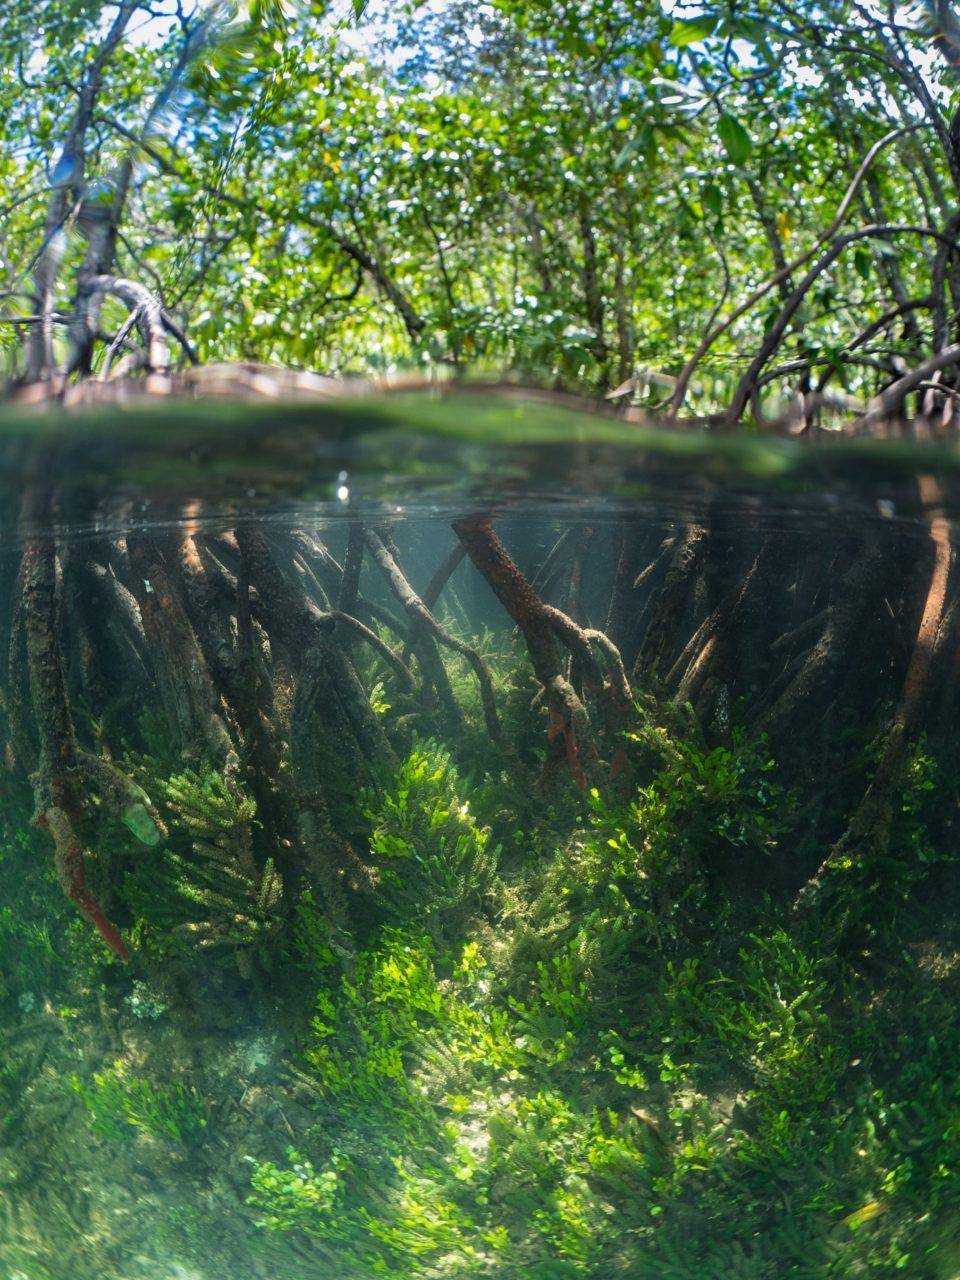 mangrove roots while snorkeling in Raja Ampat